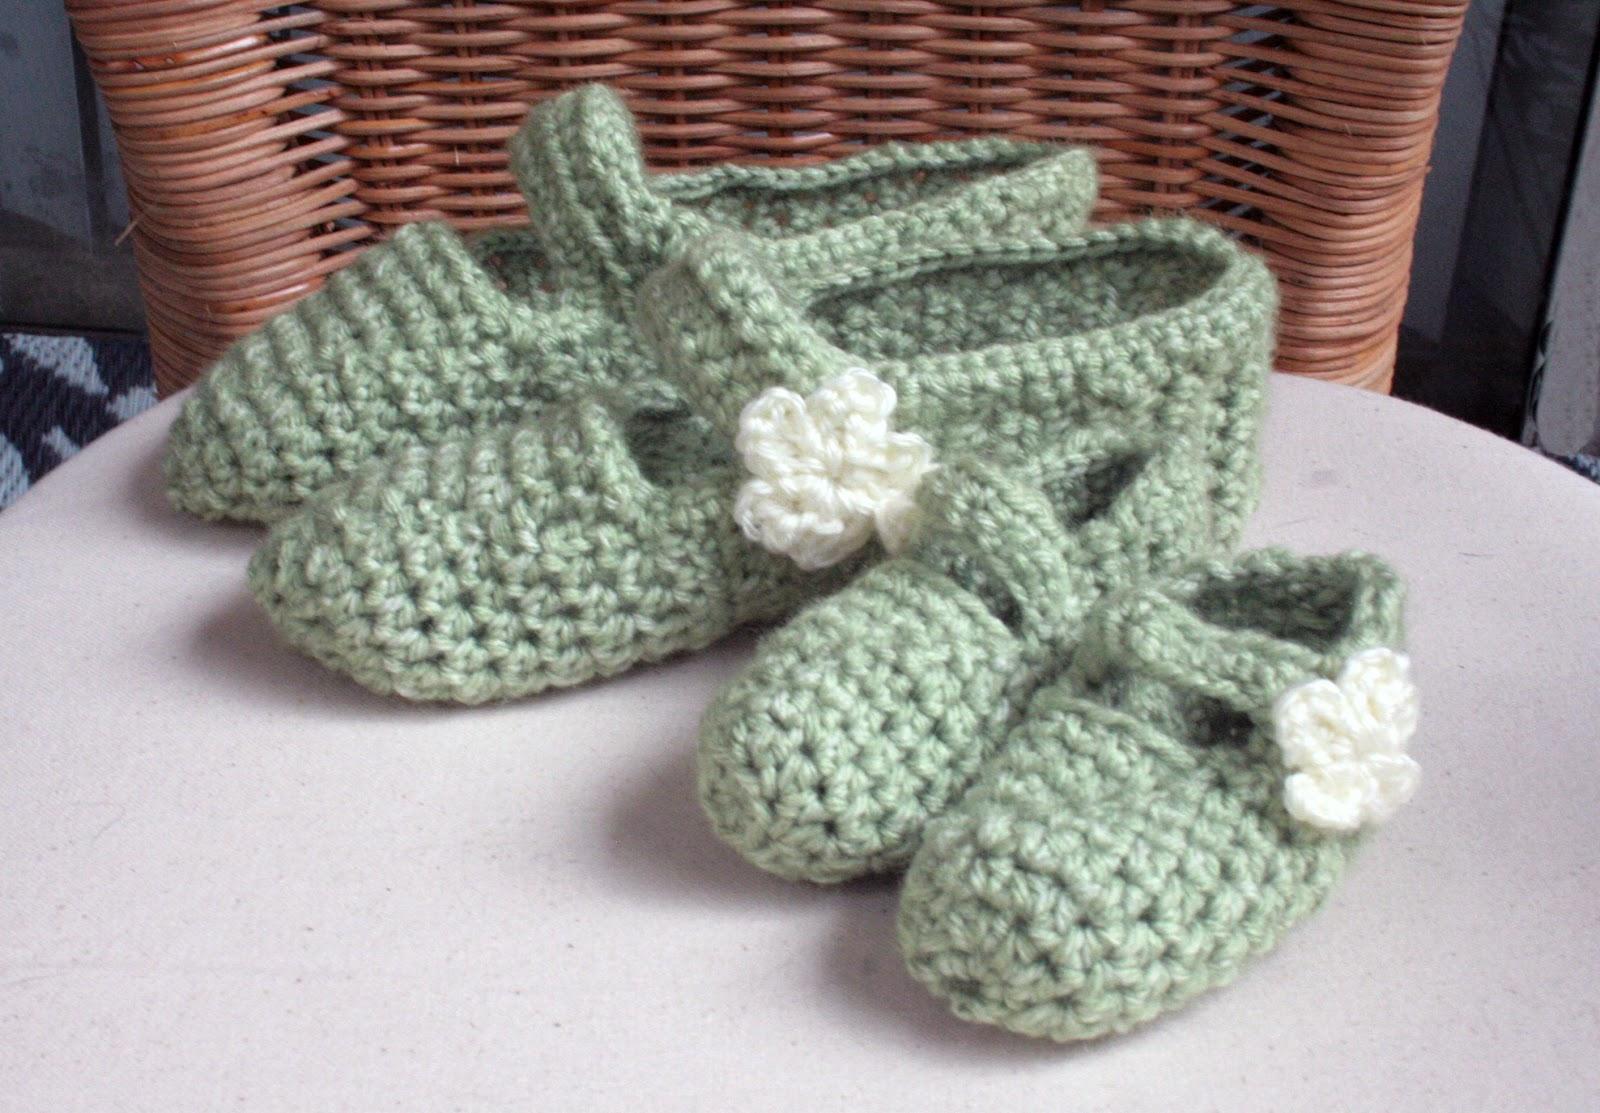 Tampa bay crochet handmade crochet mother s day gift ideas